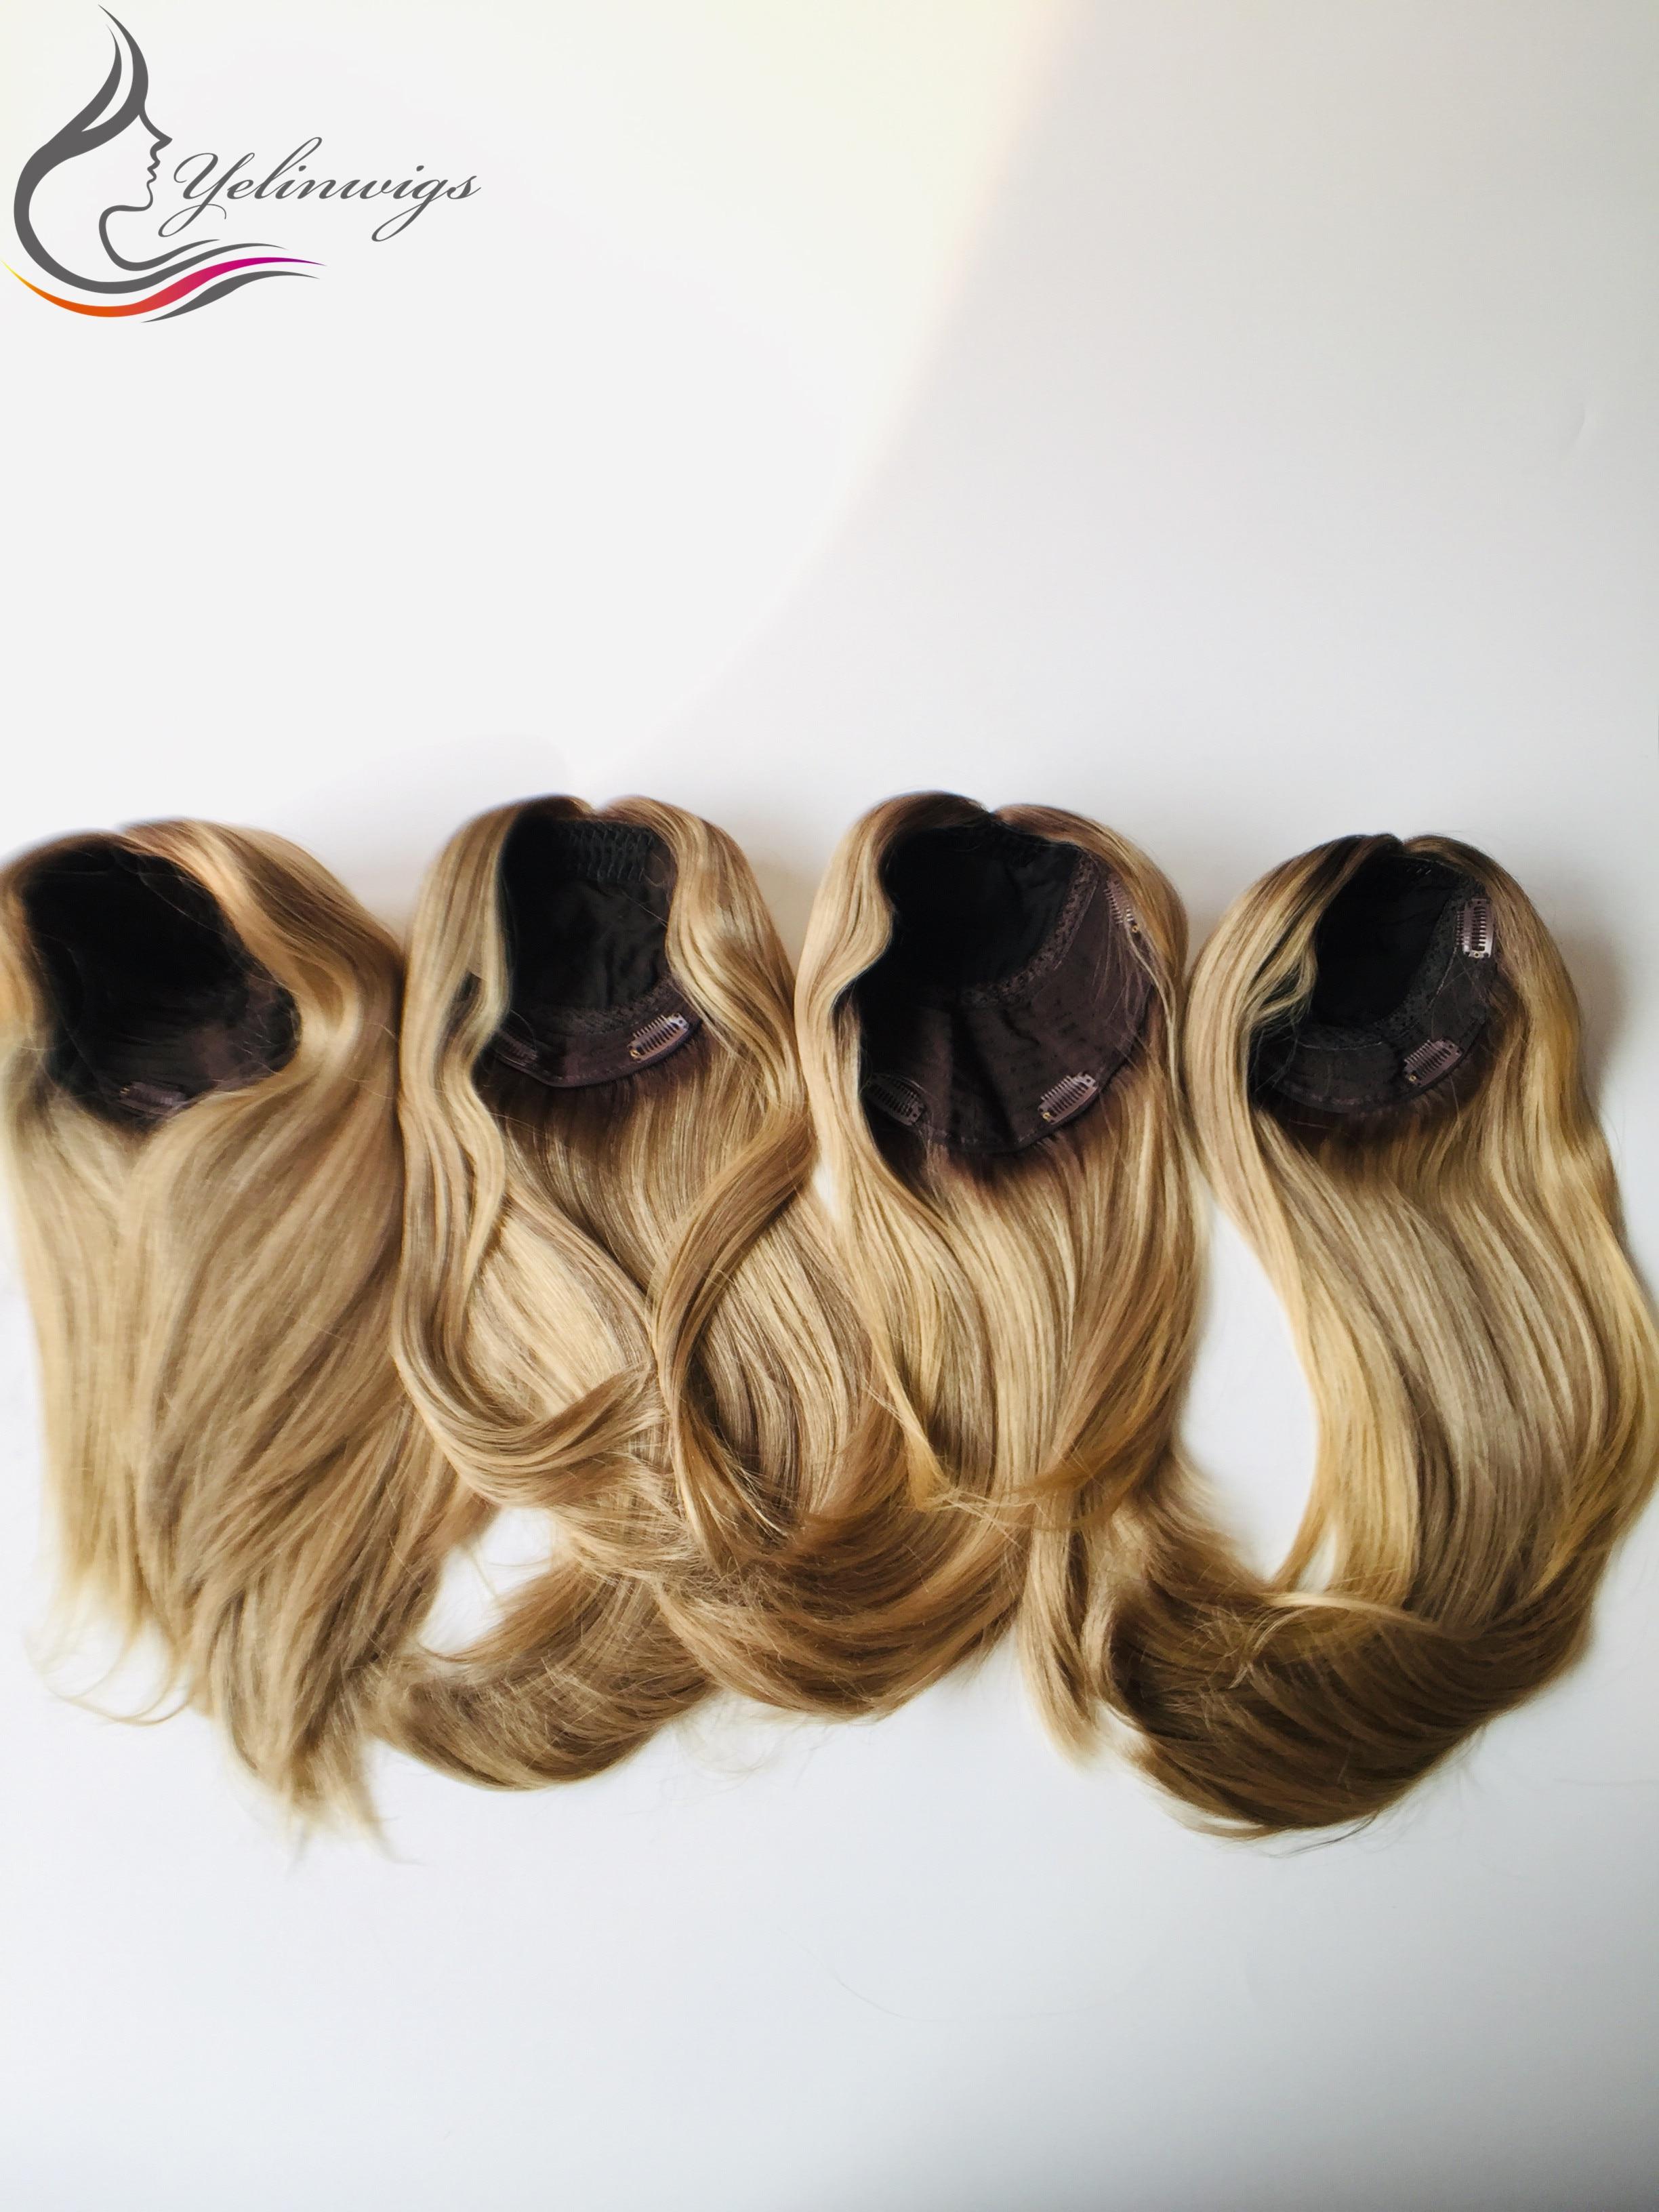 kippah queda kosher cabelo peça para as